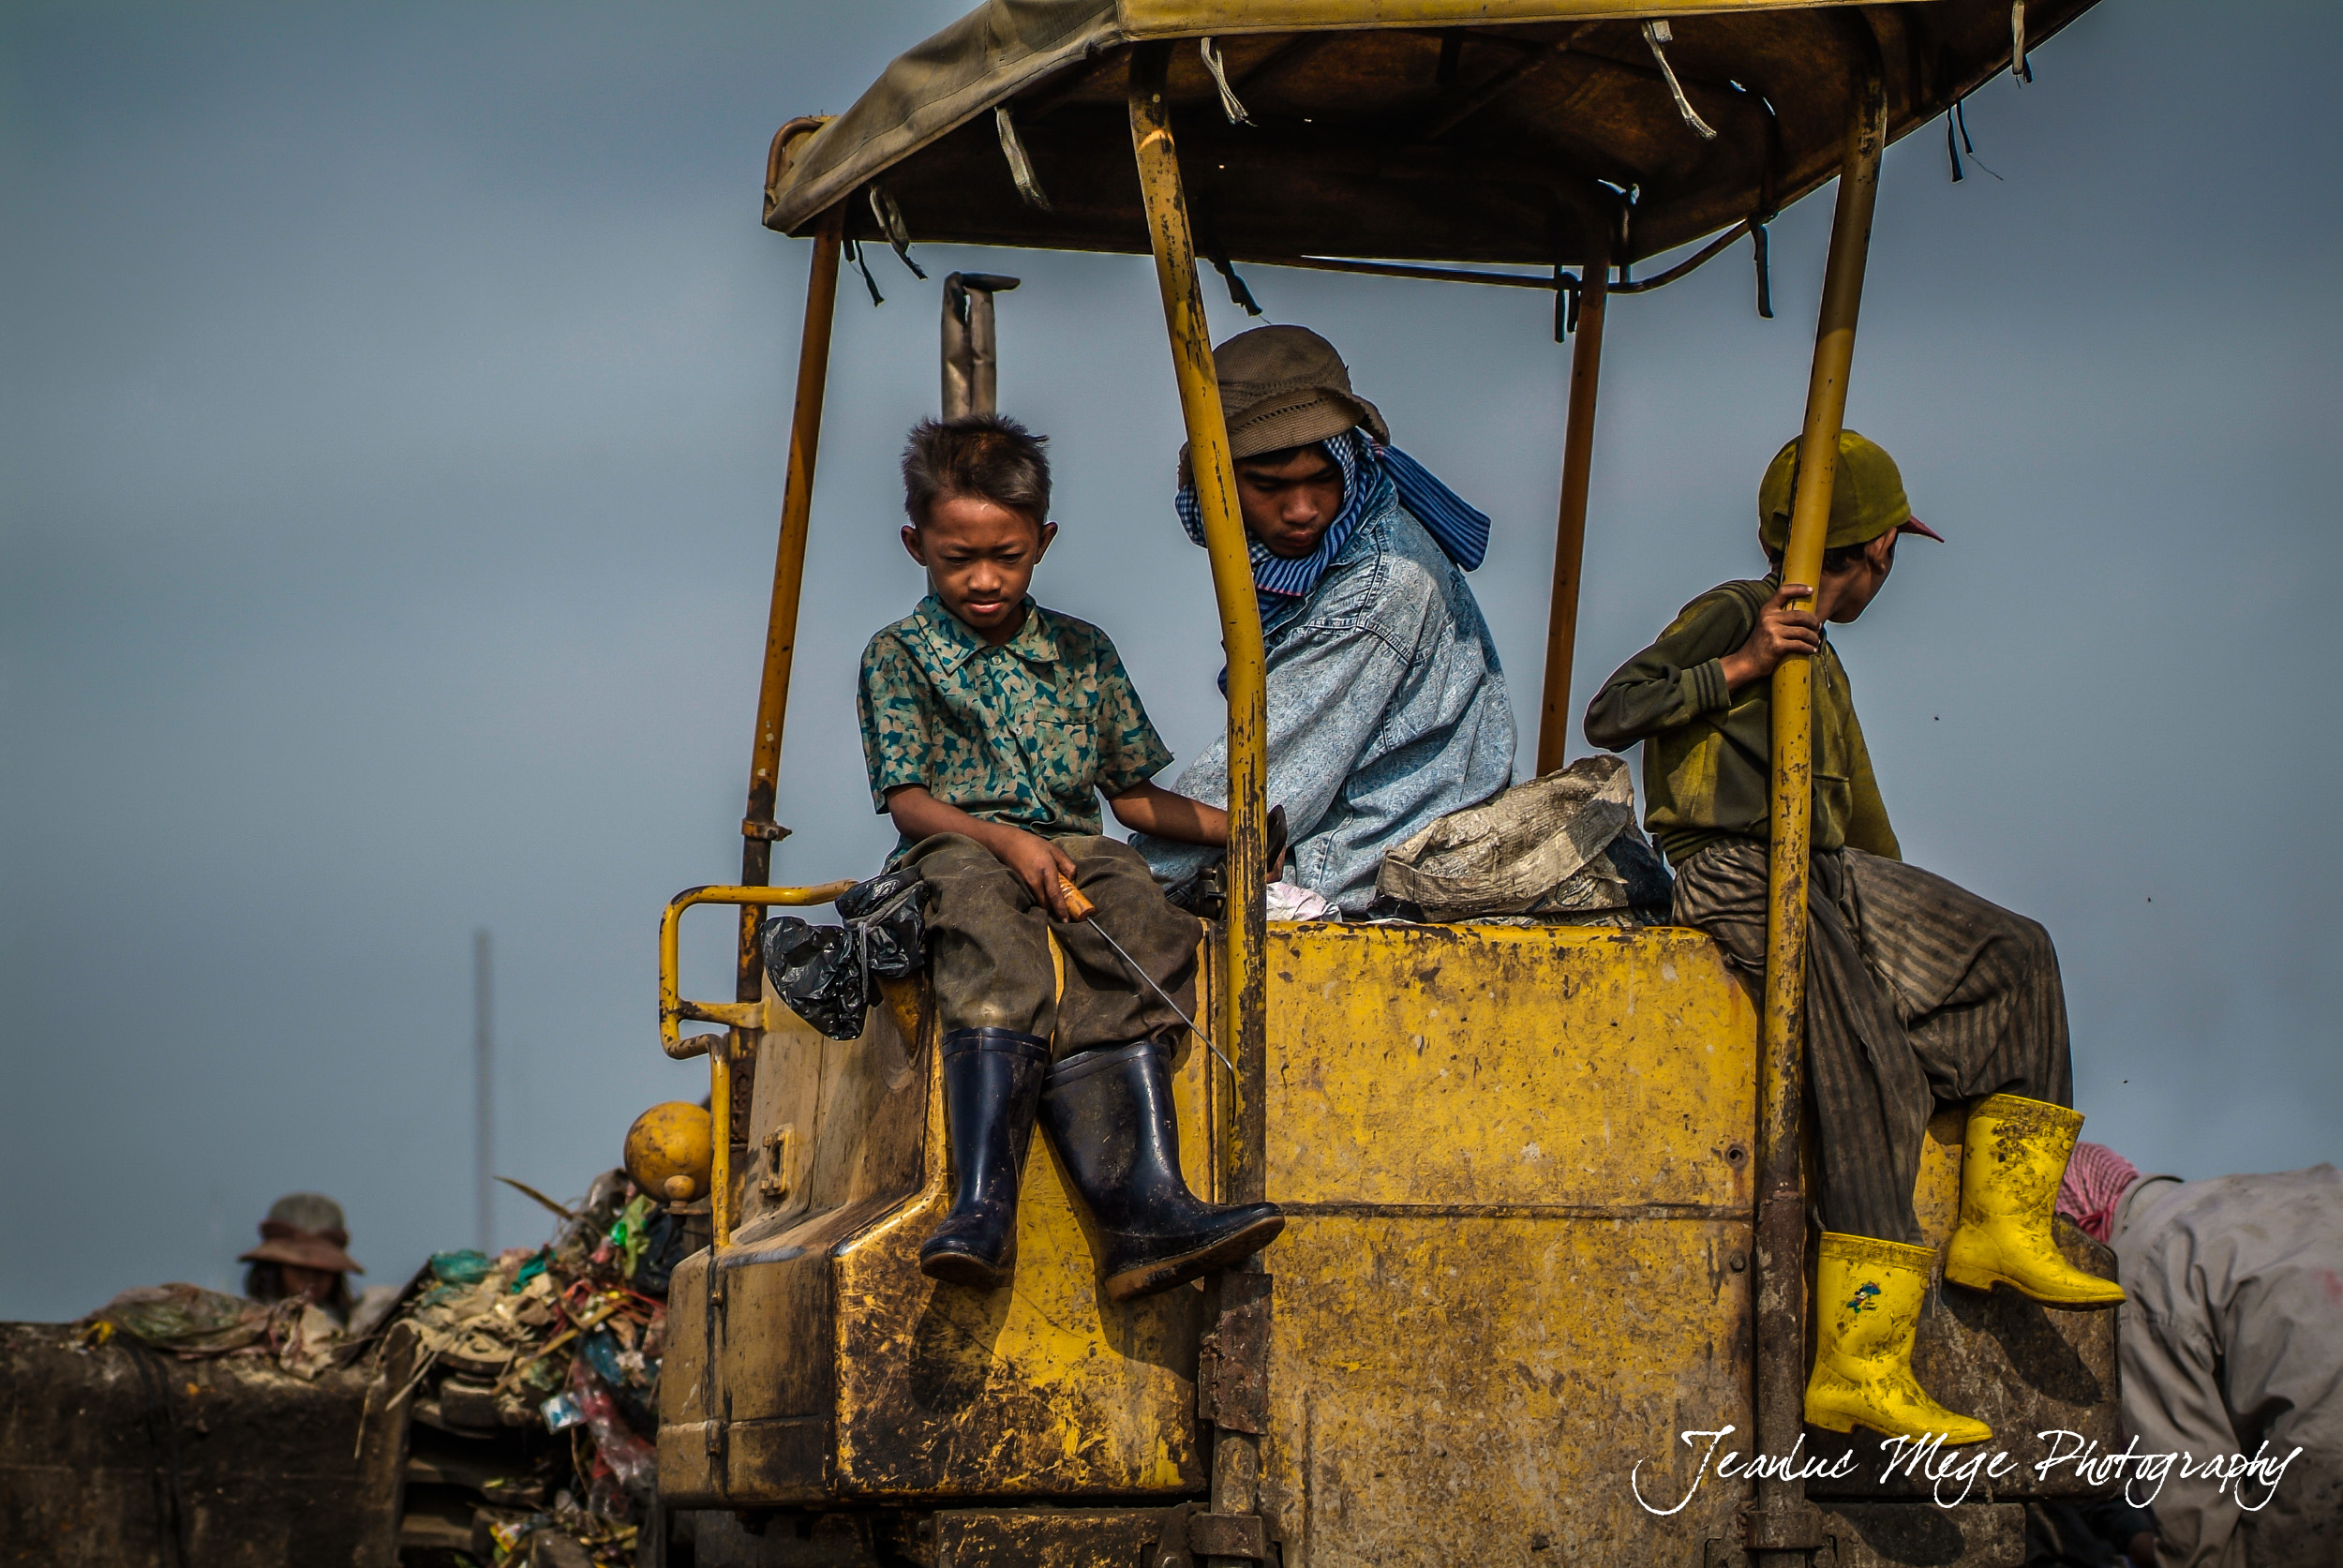 Jean Luc Mege Cambodia-8716.jpg